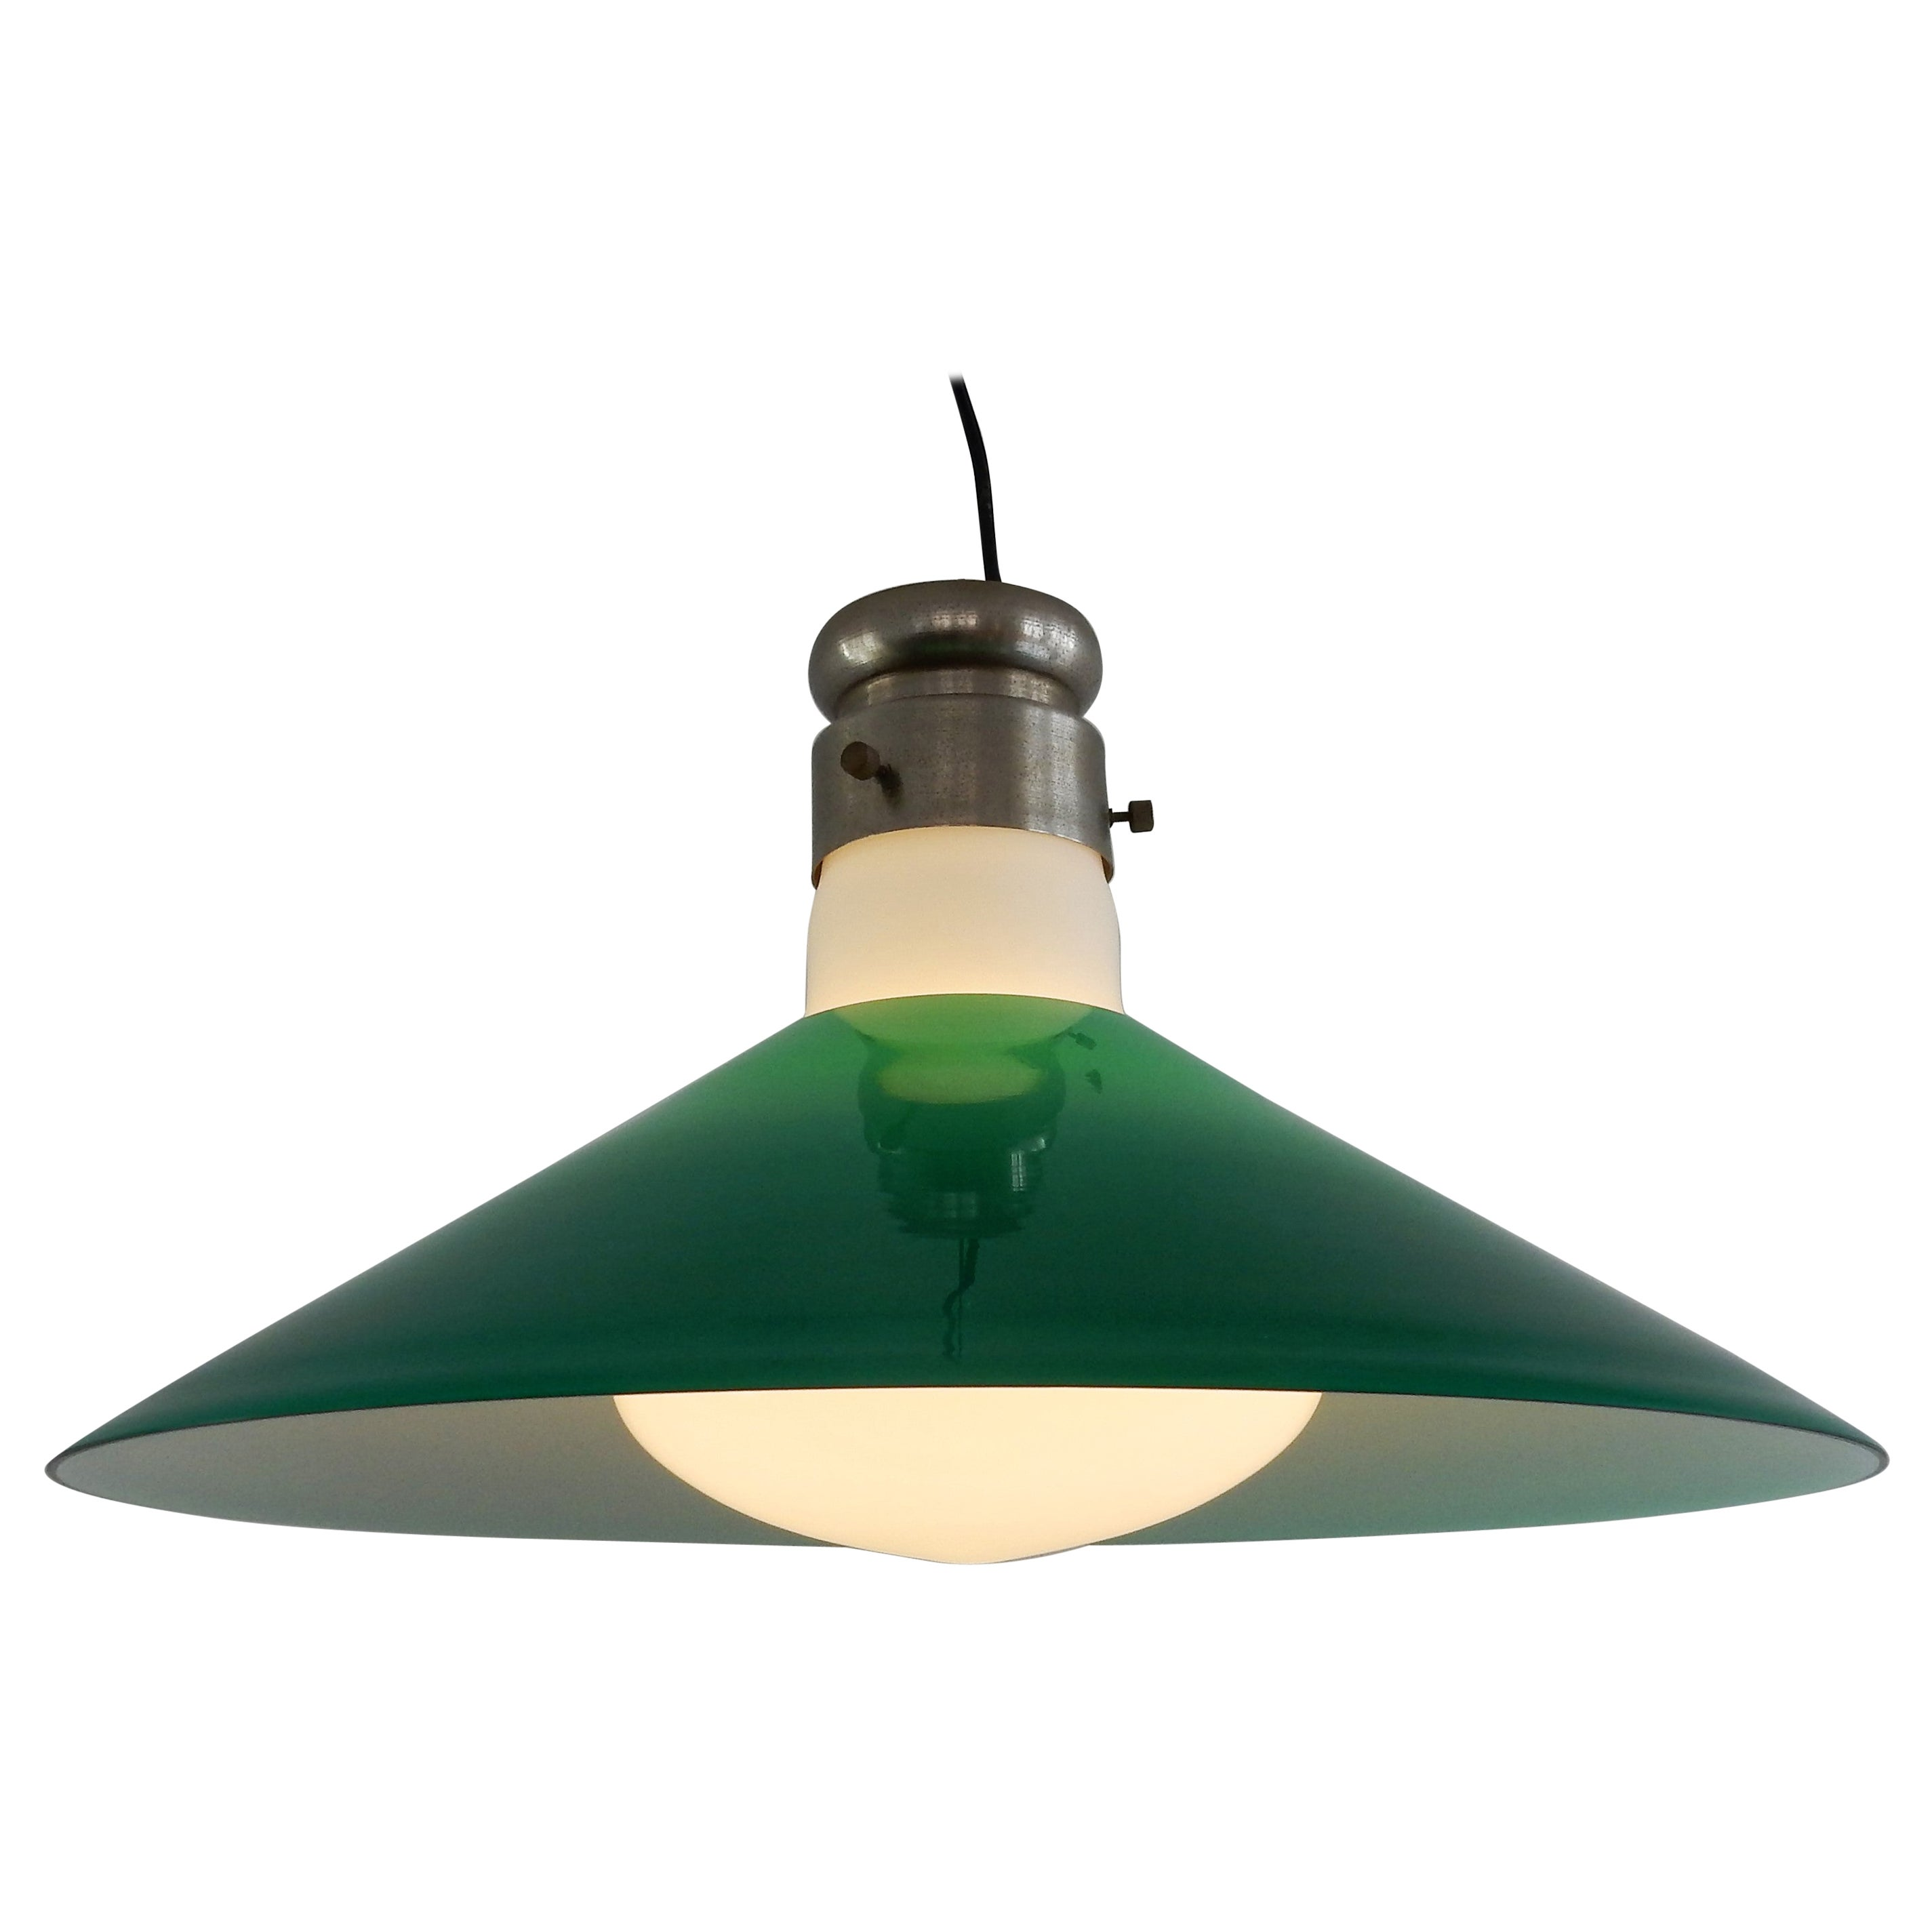 Green Murano Glass Pendant Lamp by Alessandro Pianon, for Vistosi, Italy, 1960s